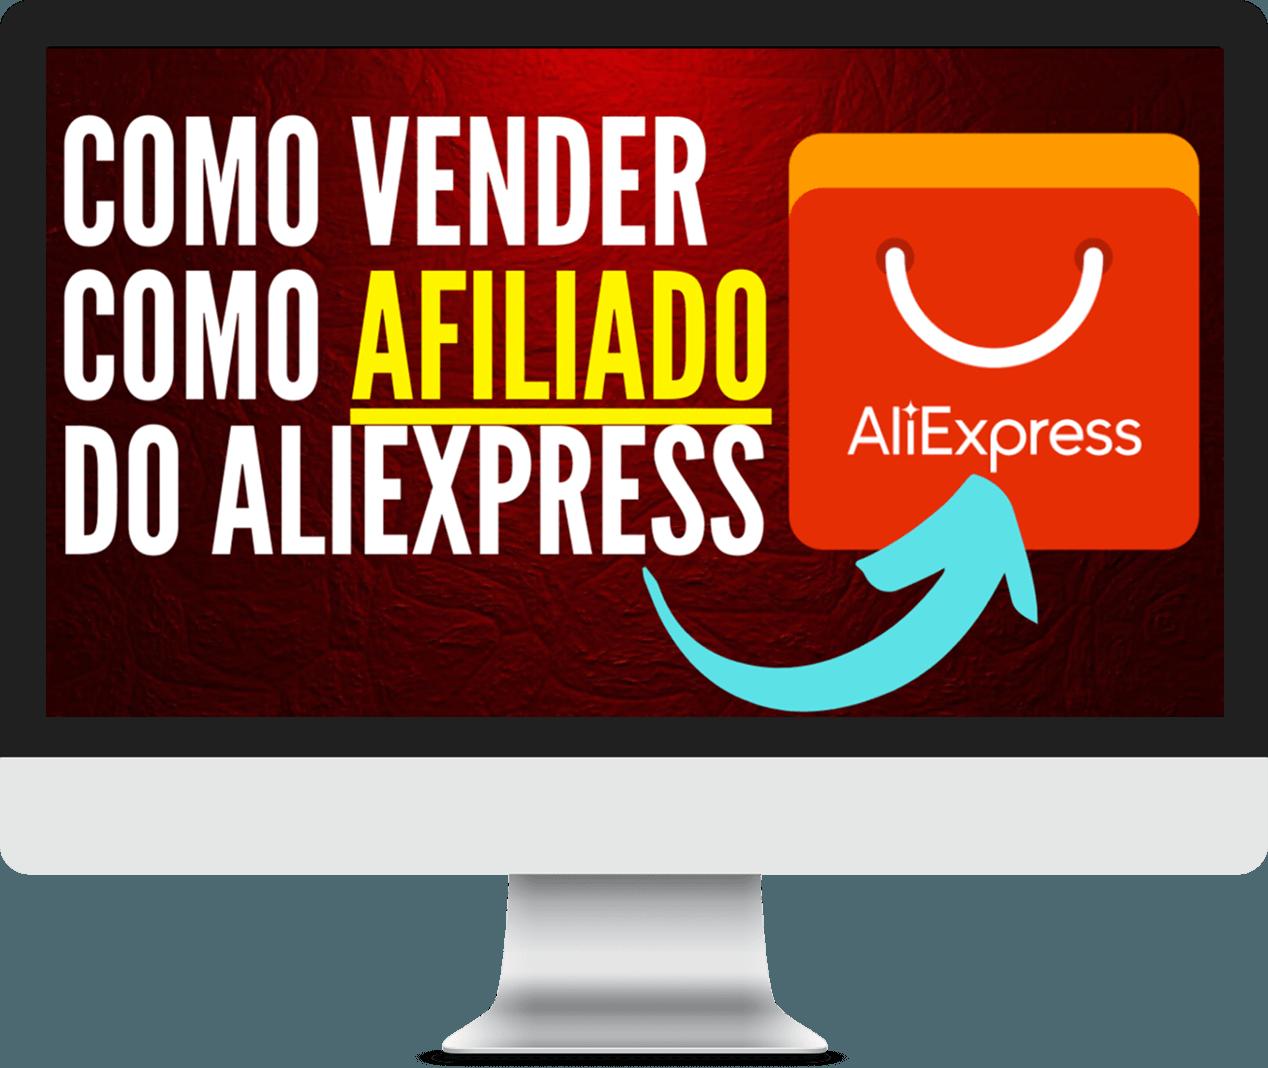 AFILIADO ALIEXPRESS